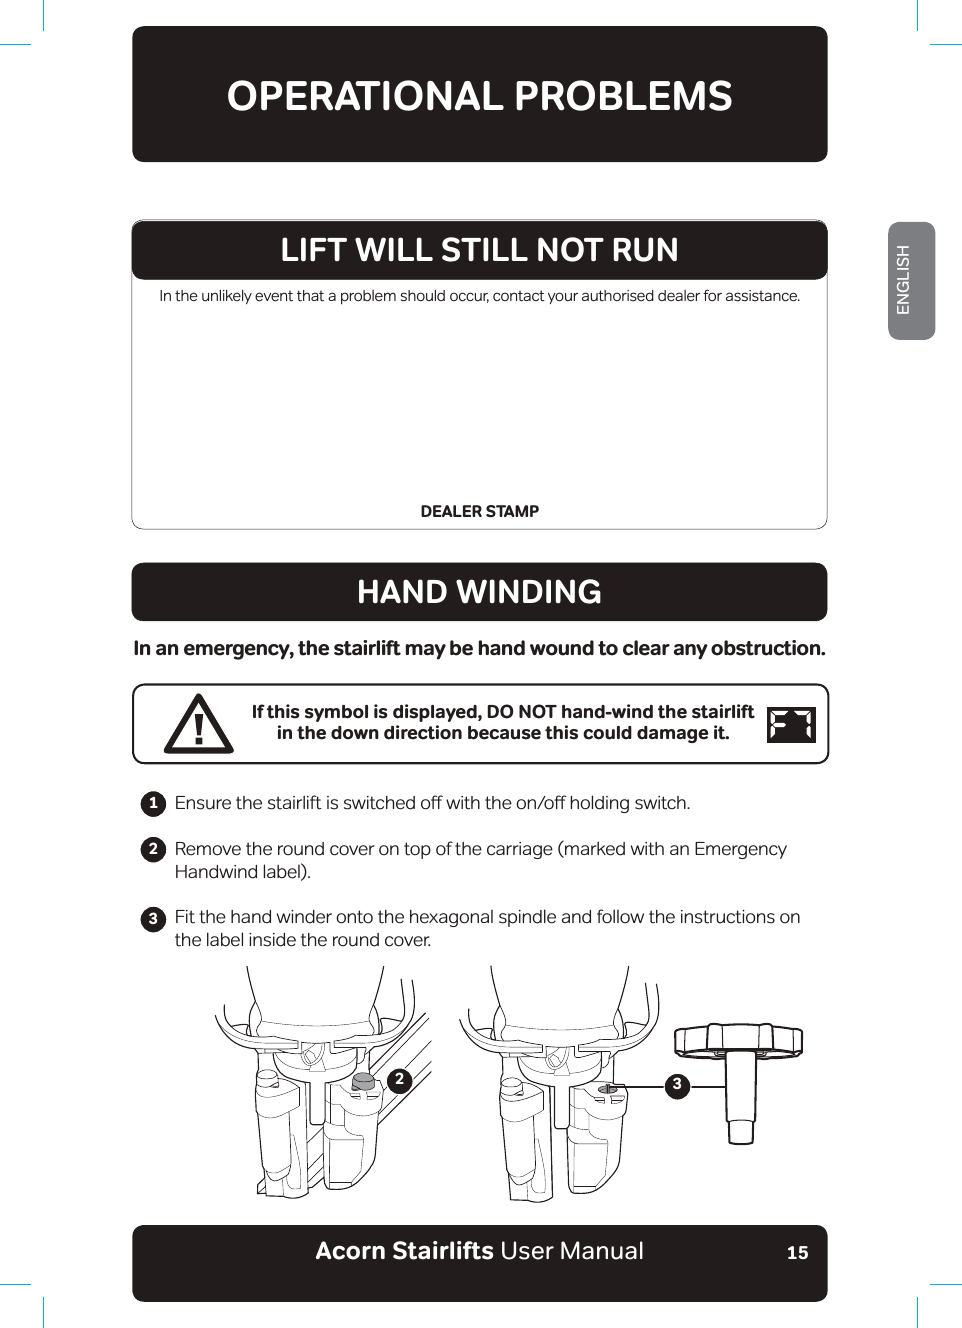 acorn mobility service acorn180hinge acorn 180 curved lift t567 user rh usermanual wiki acorn 130 stairlift manual acorn stairlift user manual